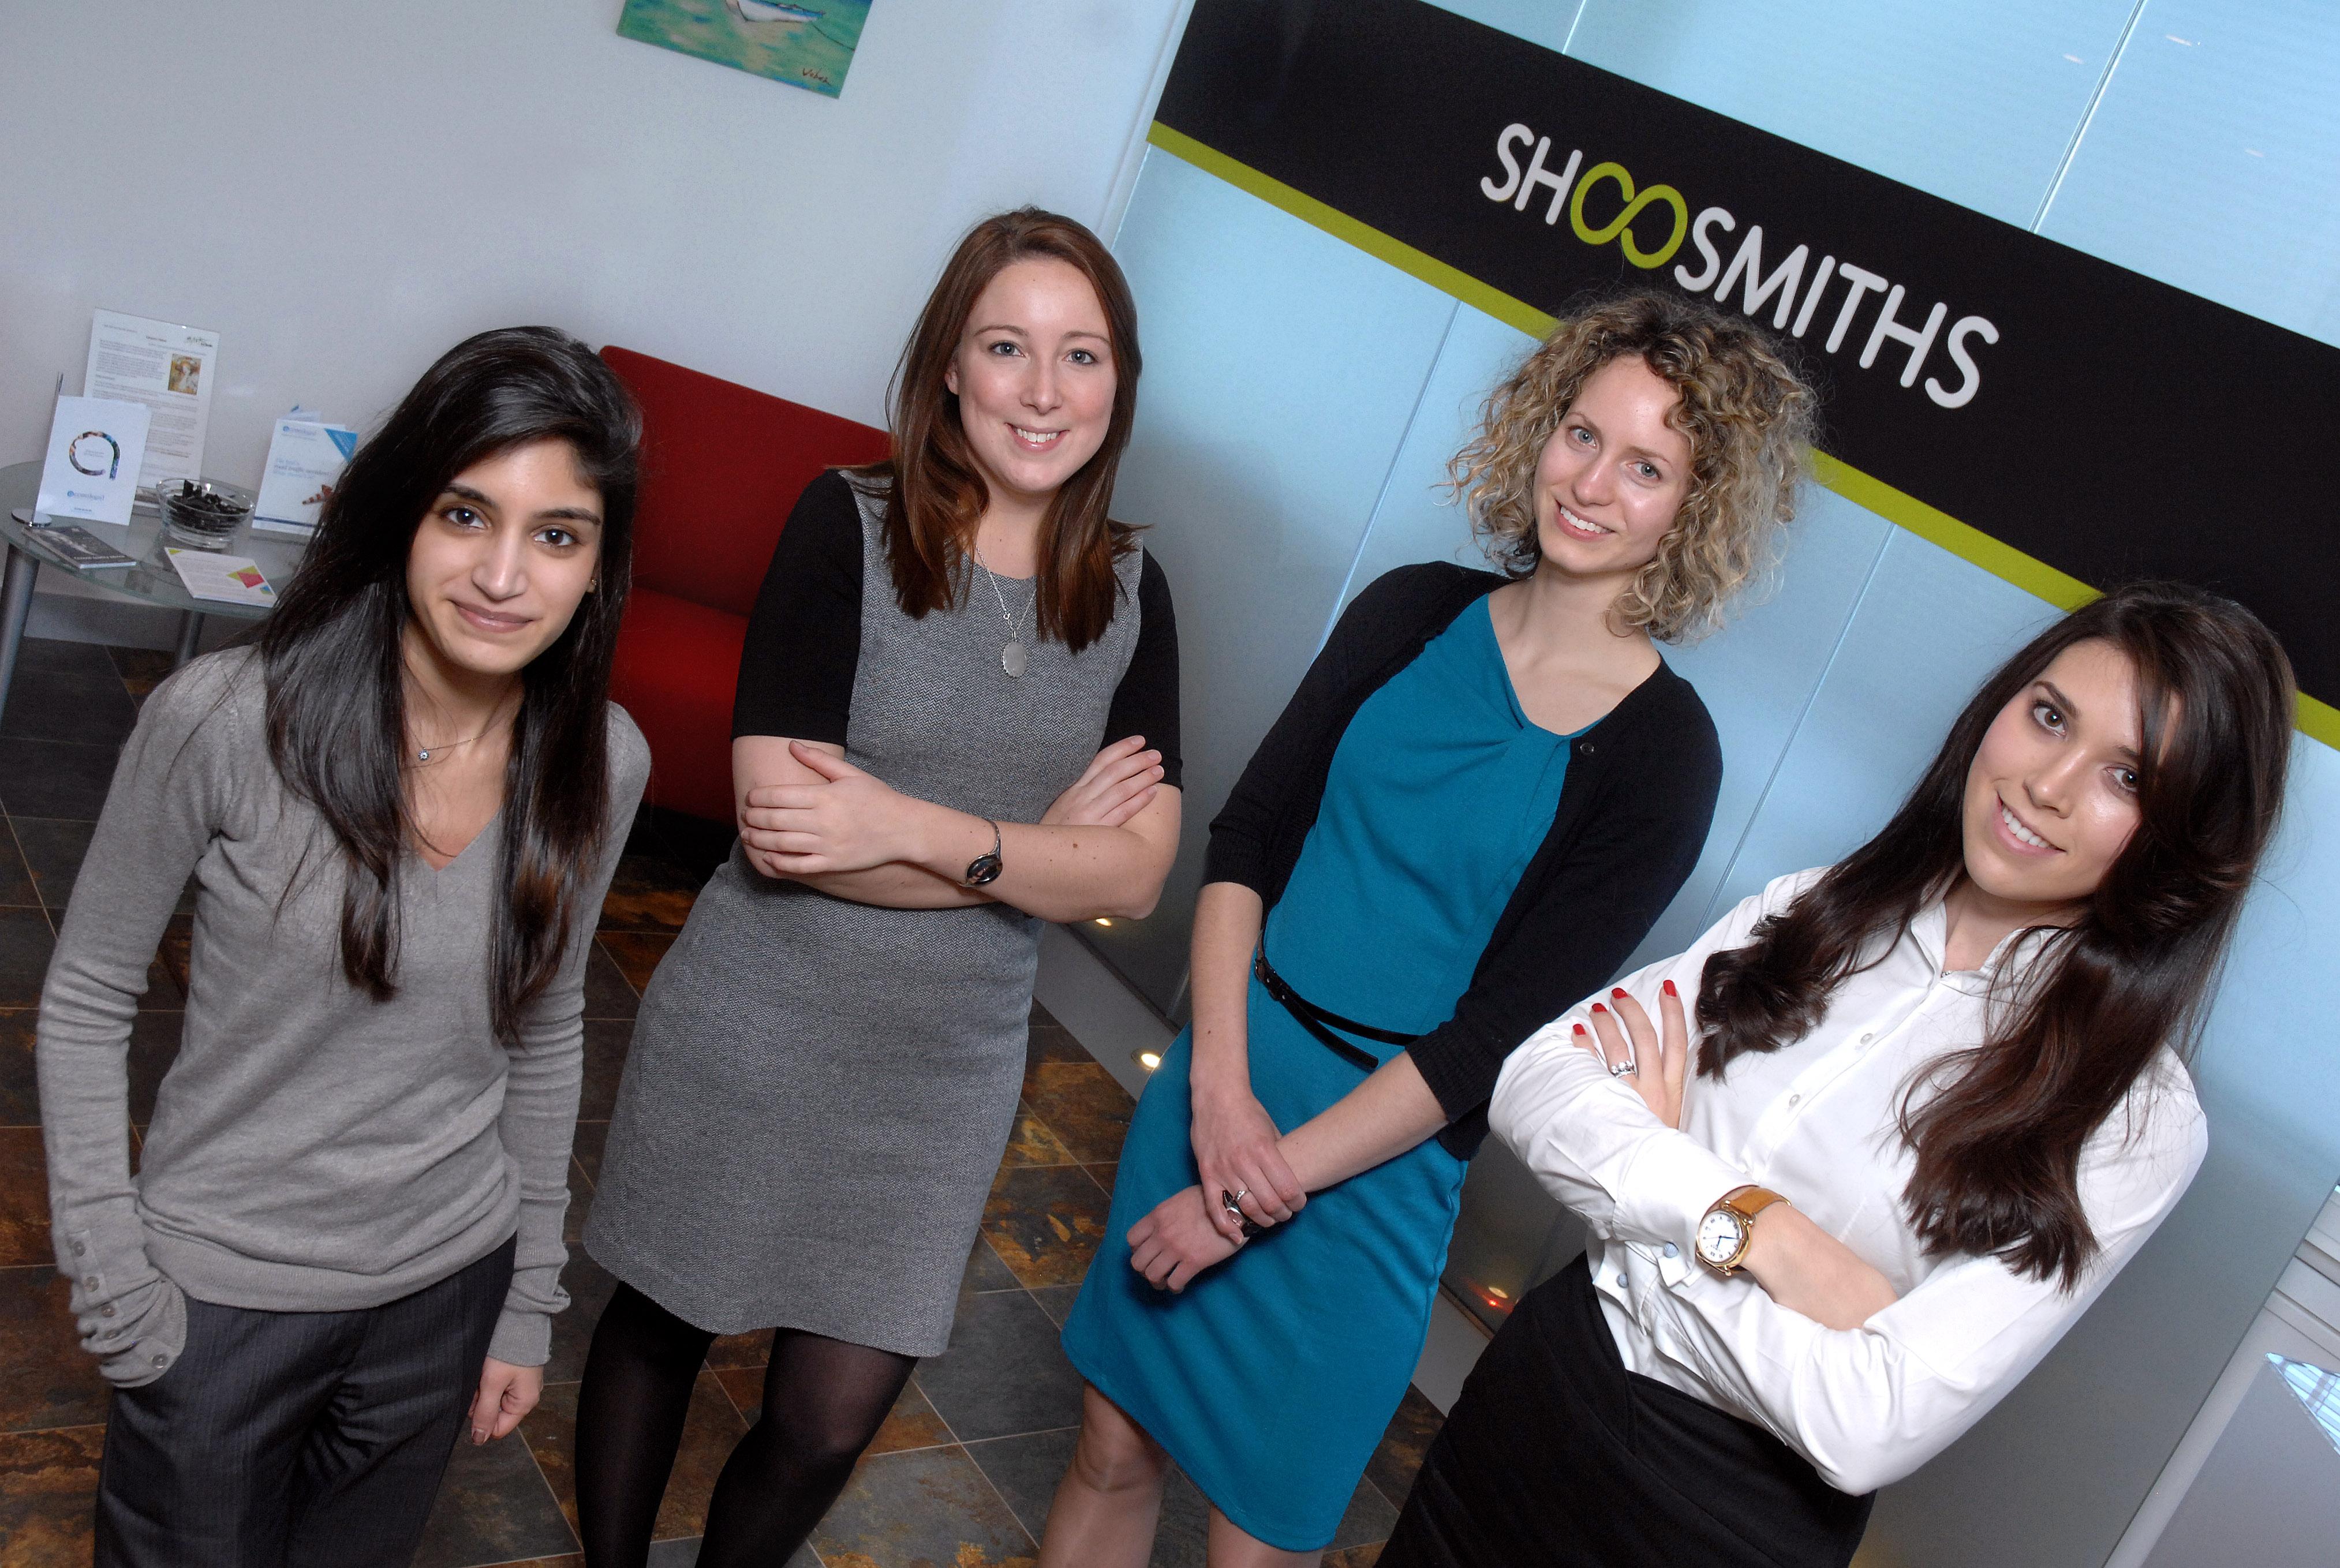 Shoosmiths Apprenticeship - The Apprentices